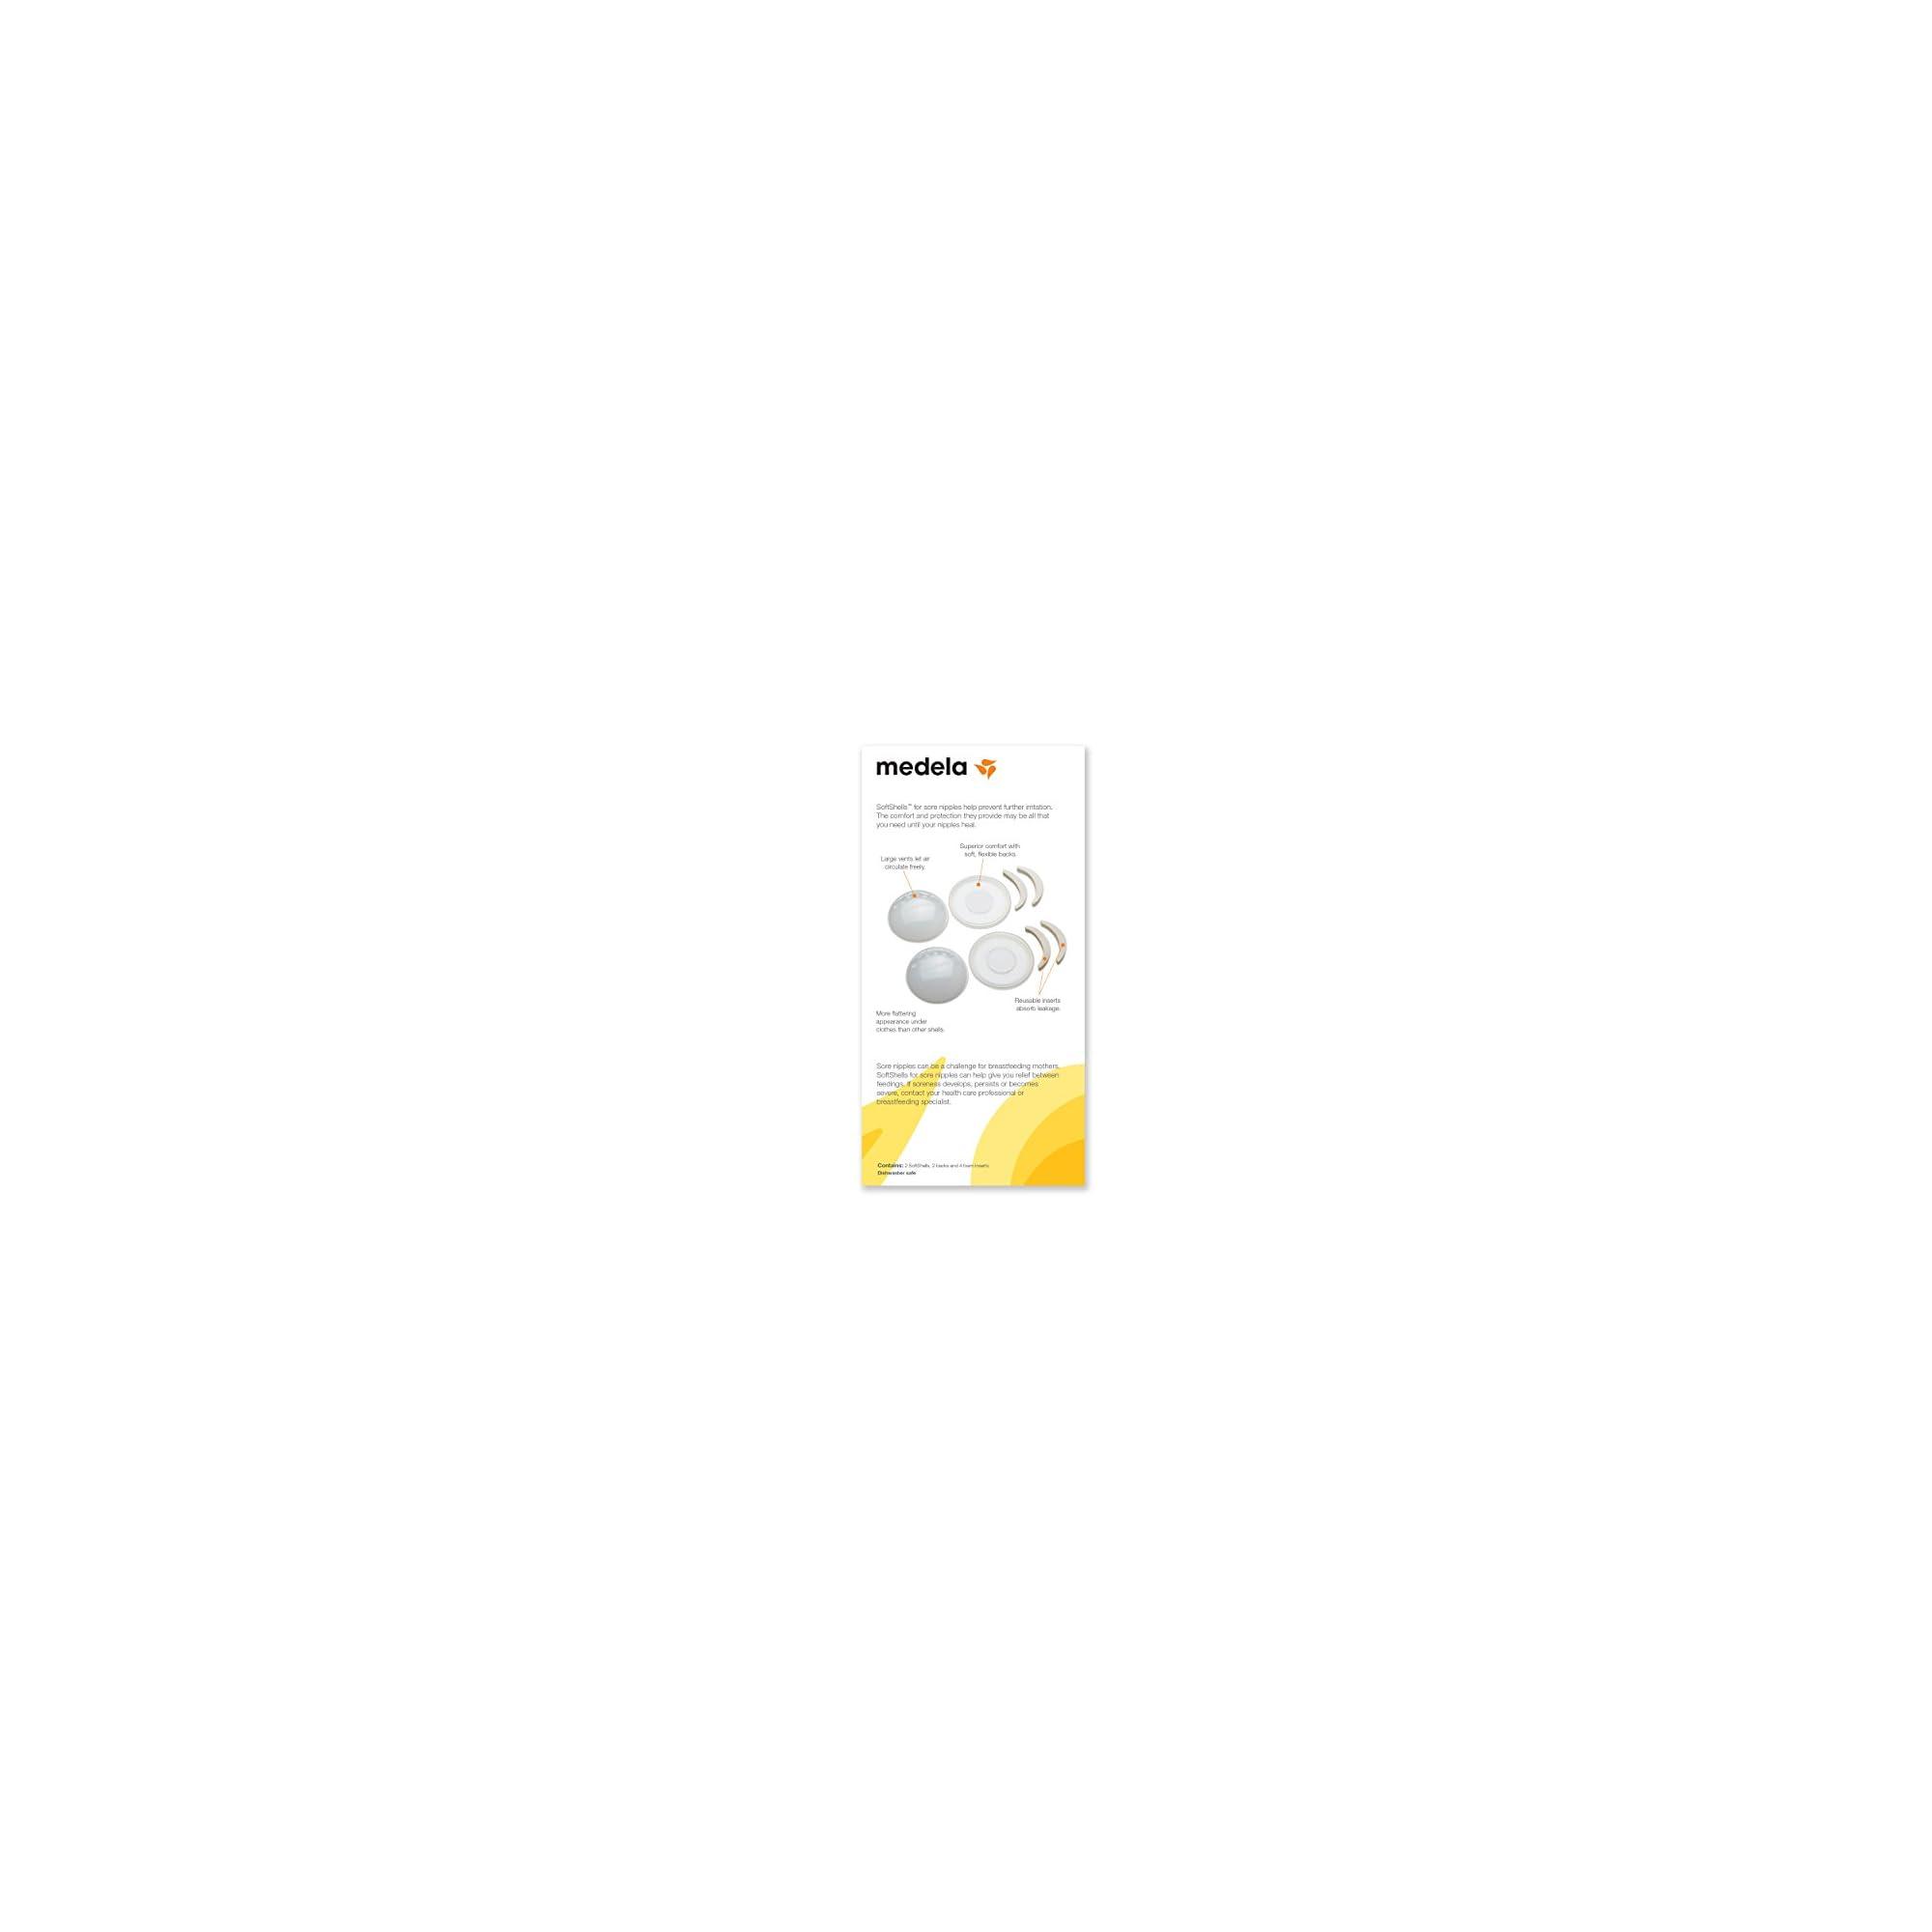 Medela SoftShells For Sore Nipples 2 Soft Shells New